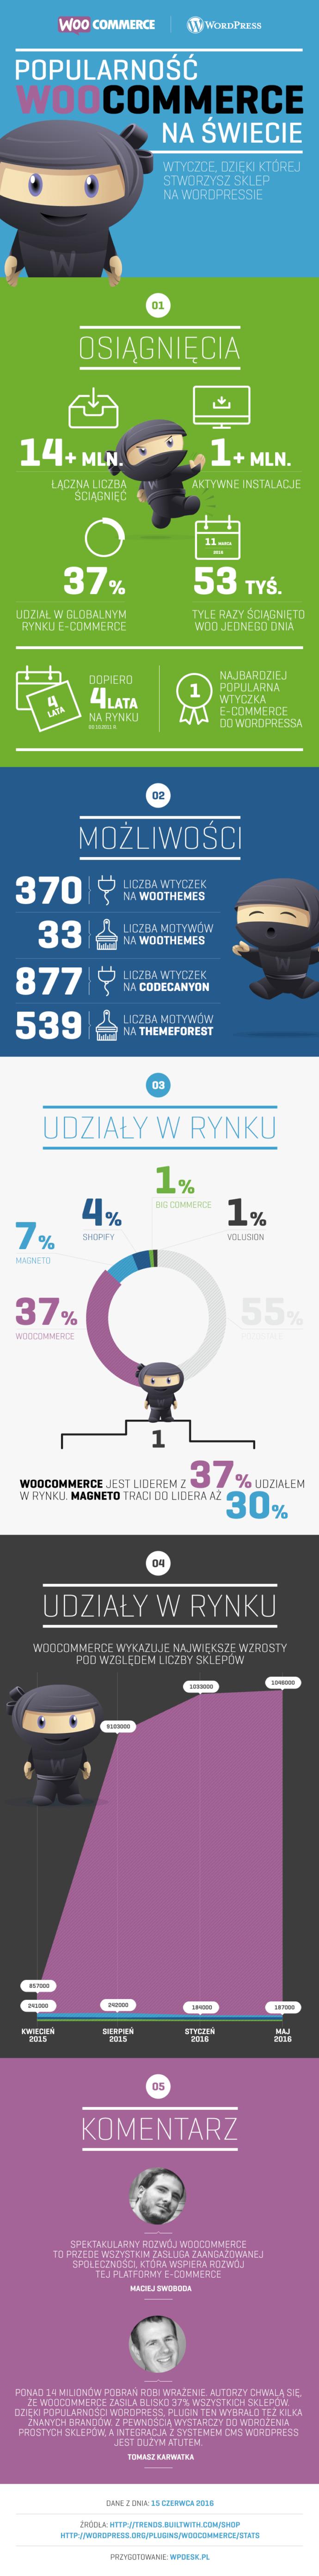 Popularność WooCommerce - infografika